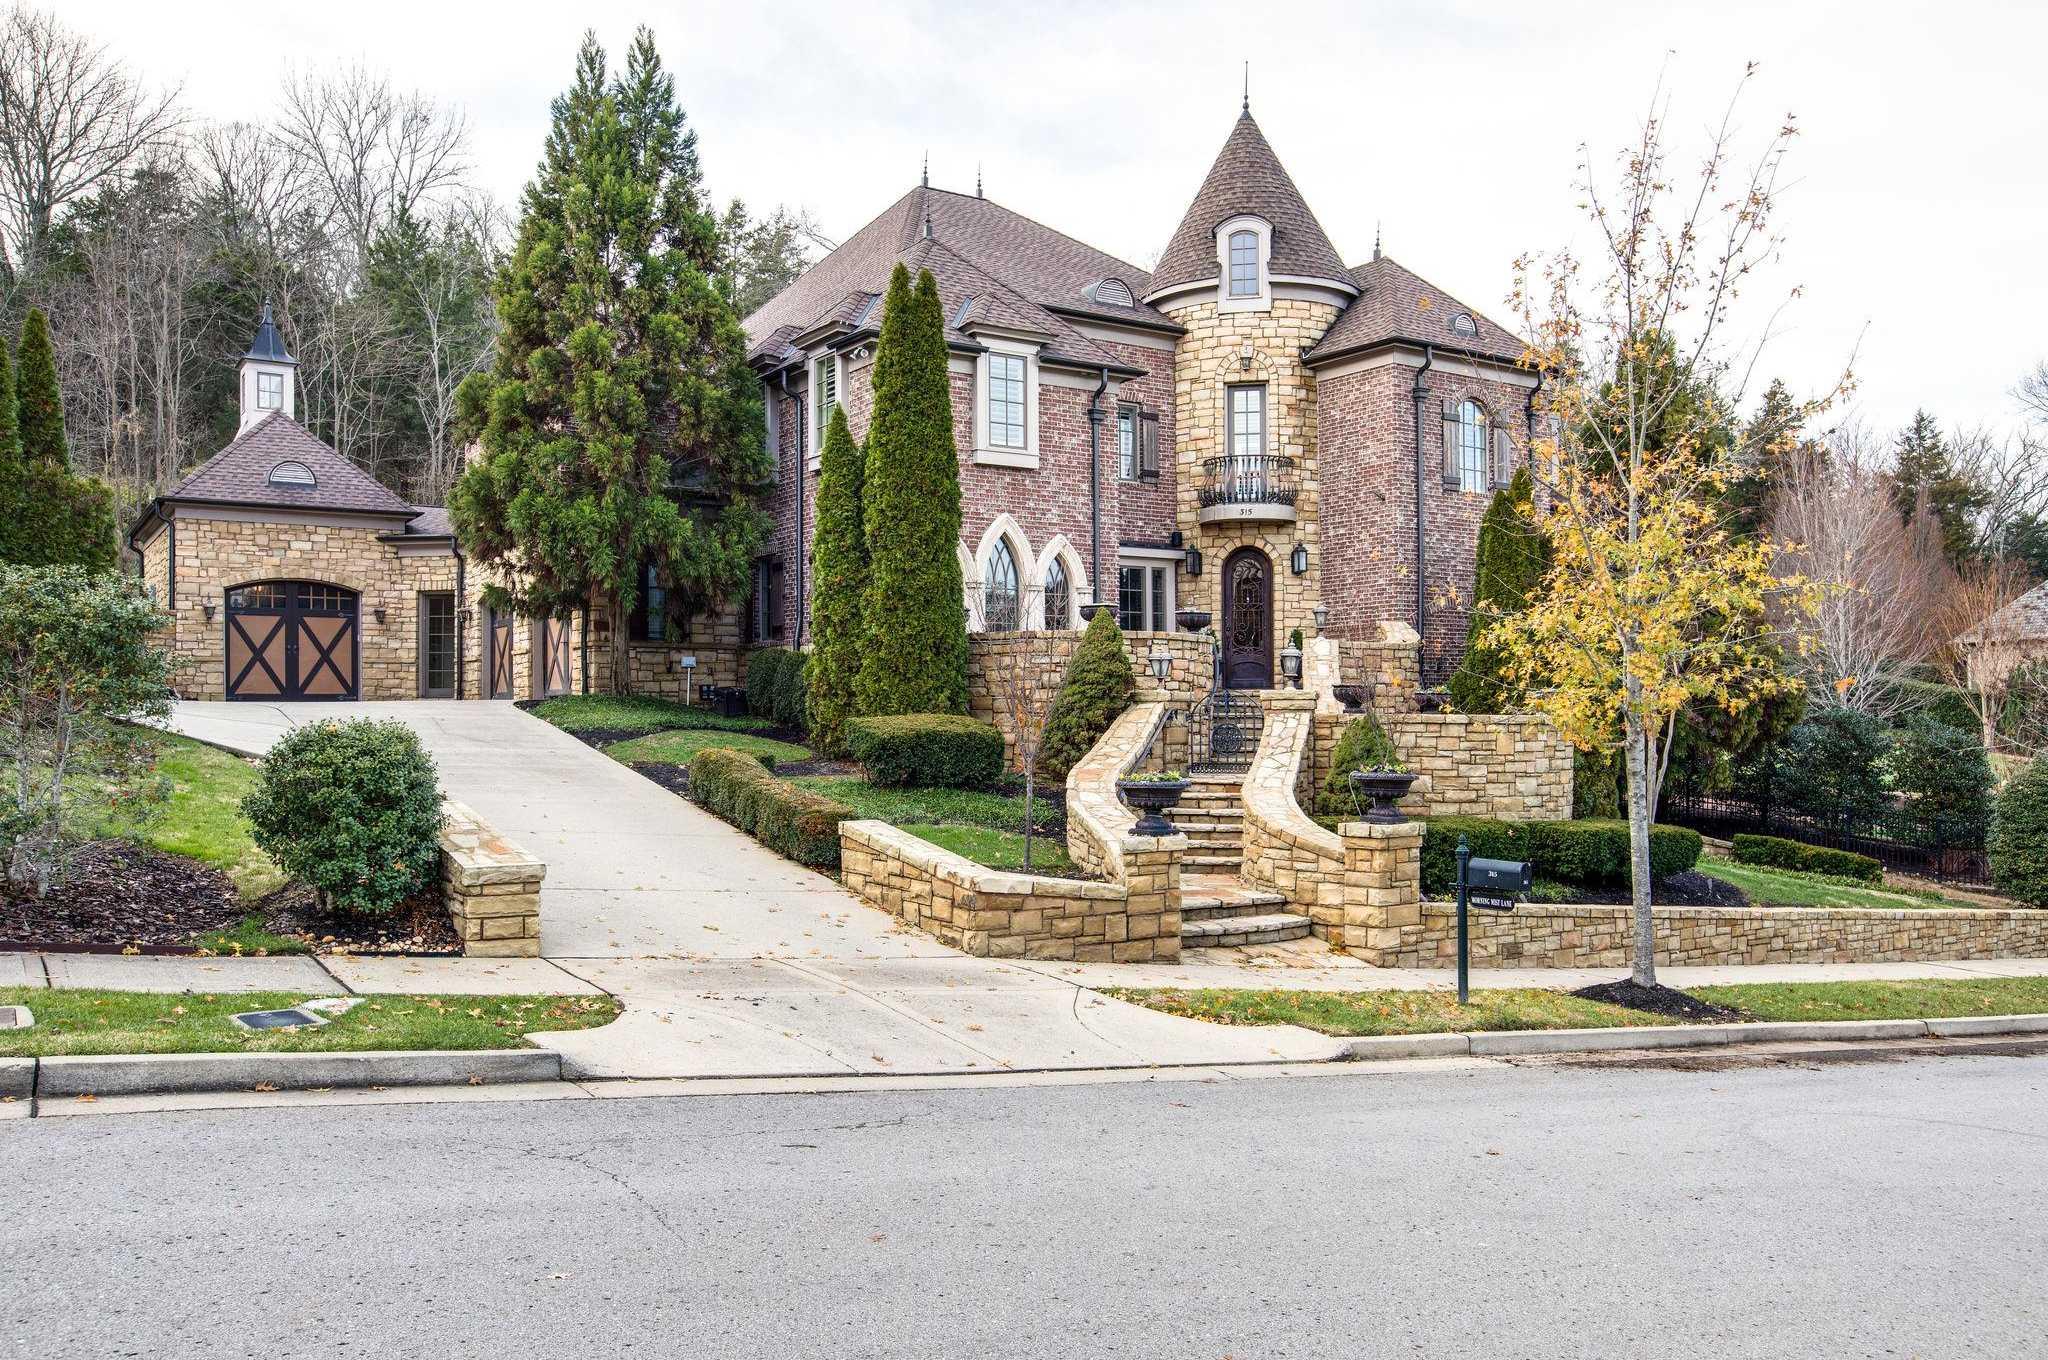 $1,950,000 - 6Br/7Ba -  for Sale in Westhaven Sec 7, Franklin